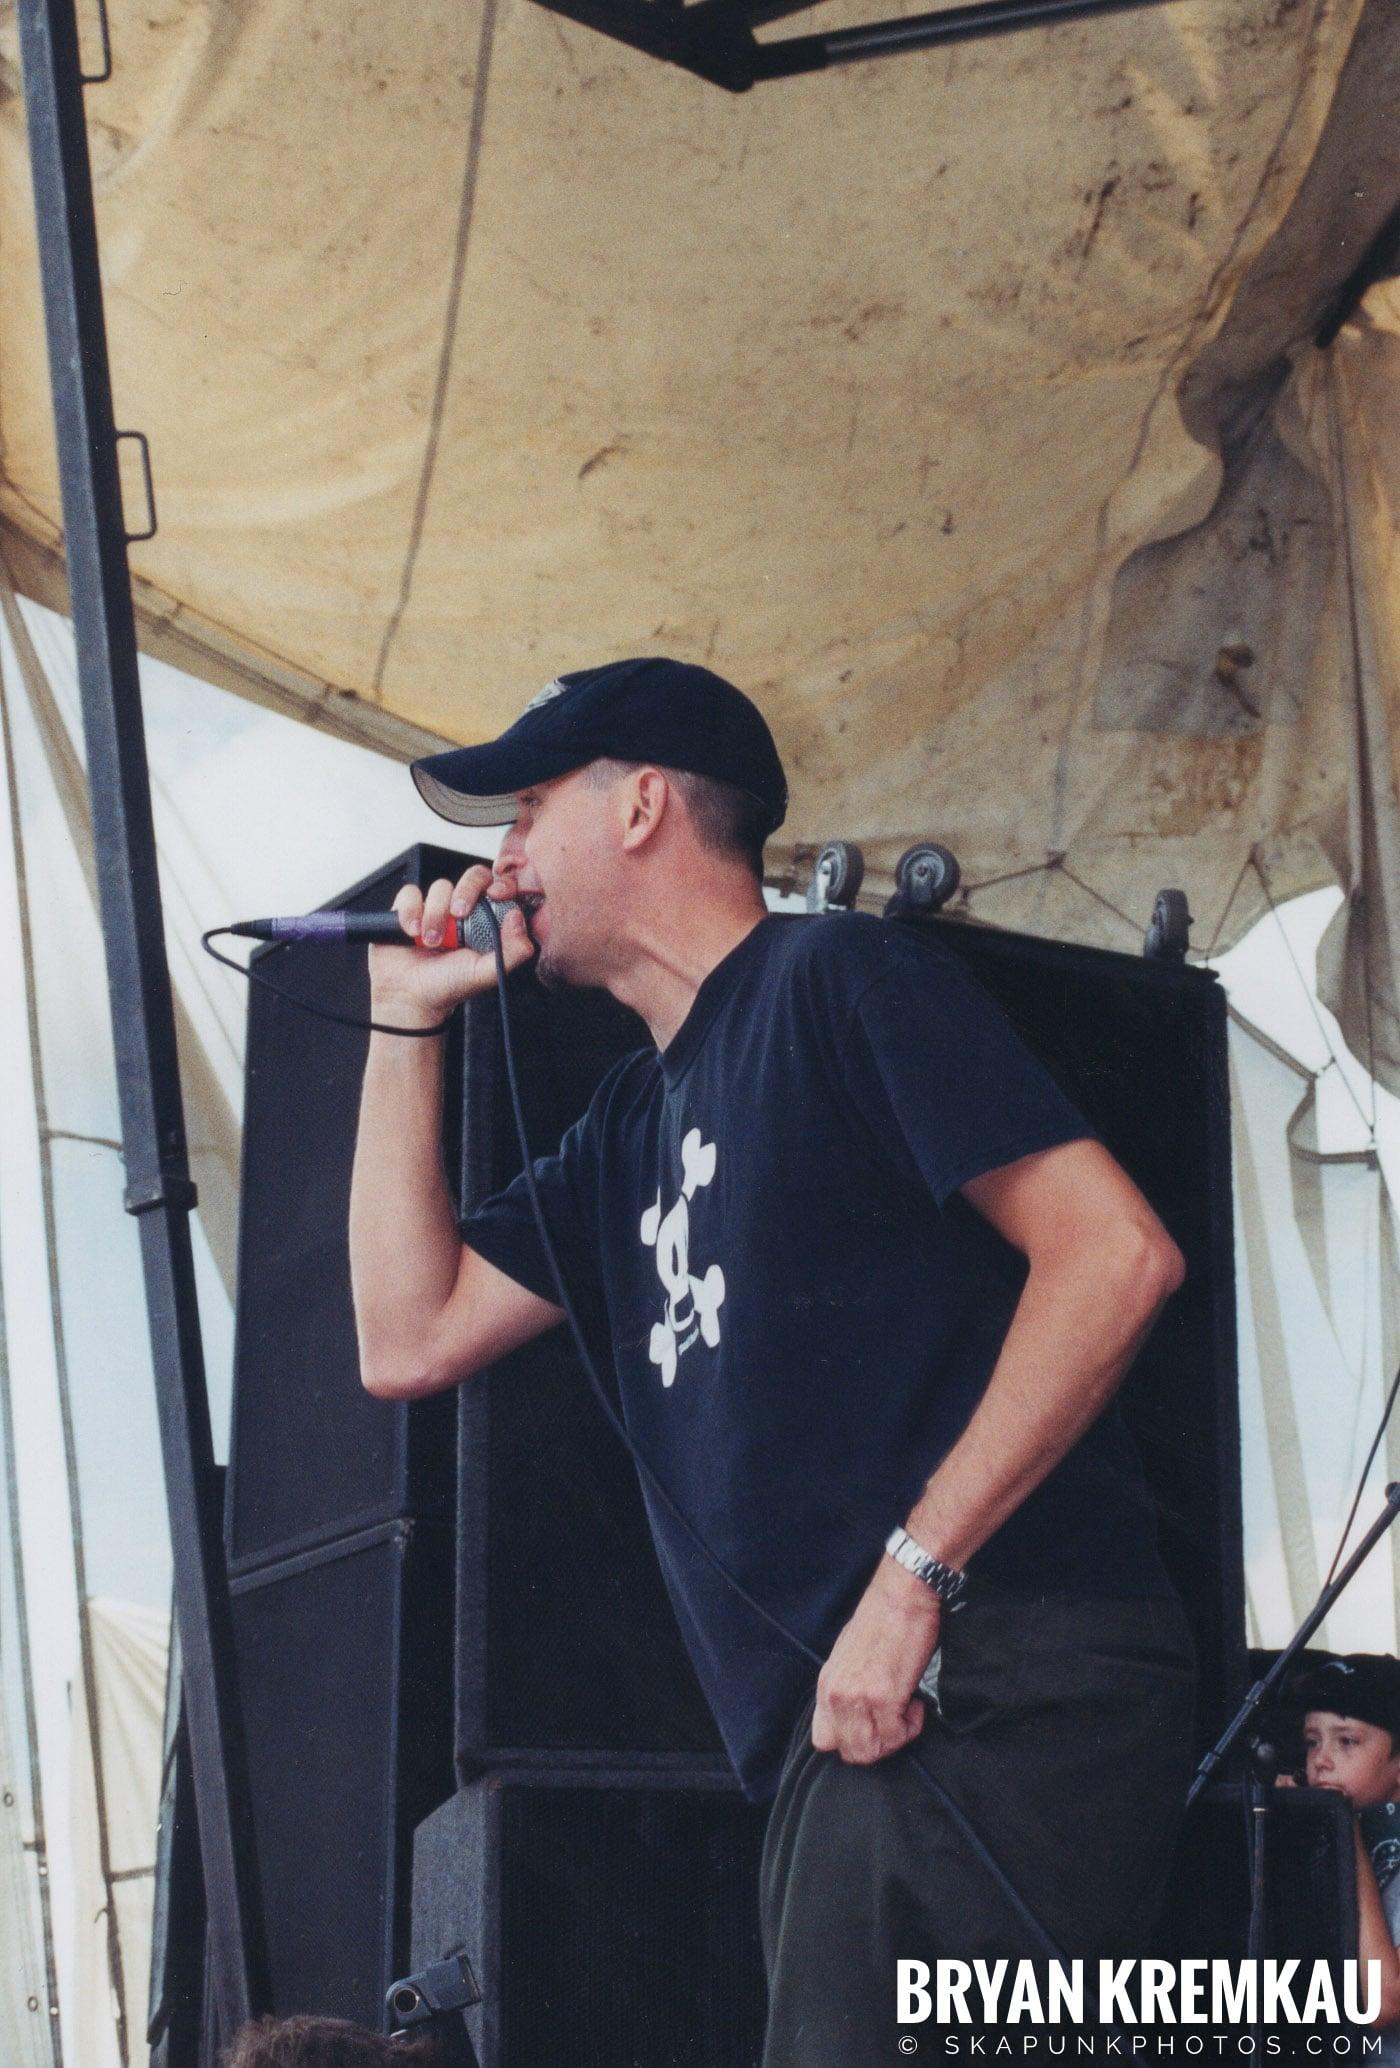 The Vandals @ Vans Warped Tour, Randall's Island, NYC - 8.7.04 (10)